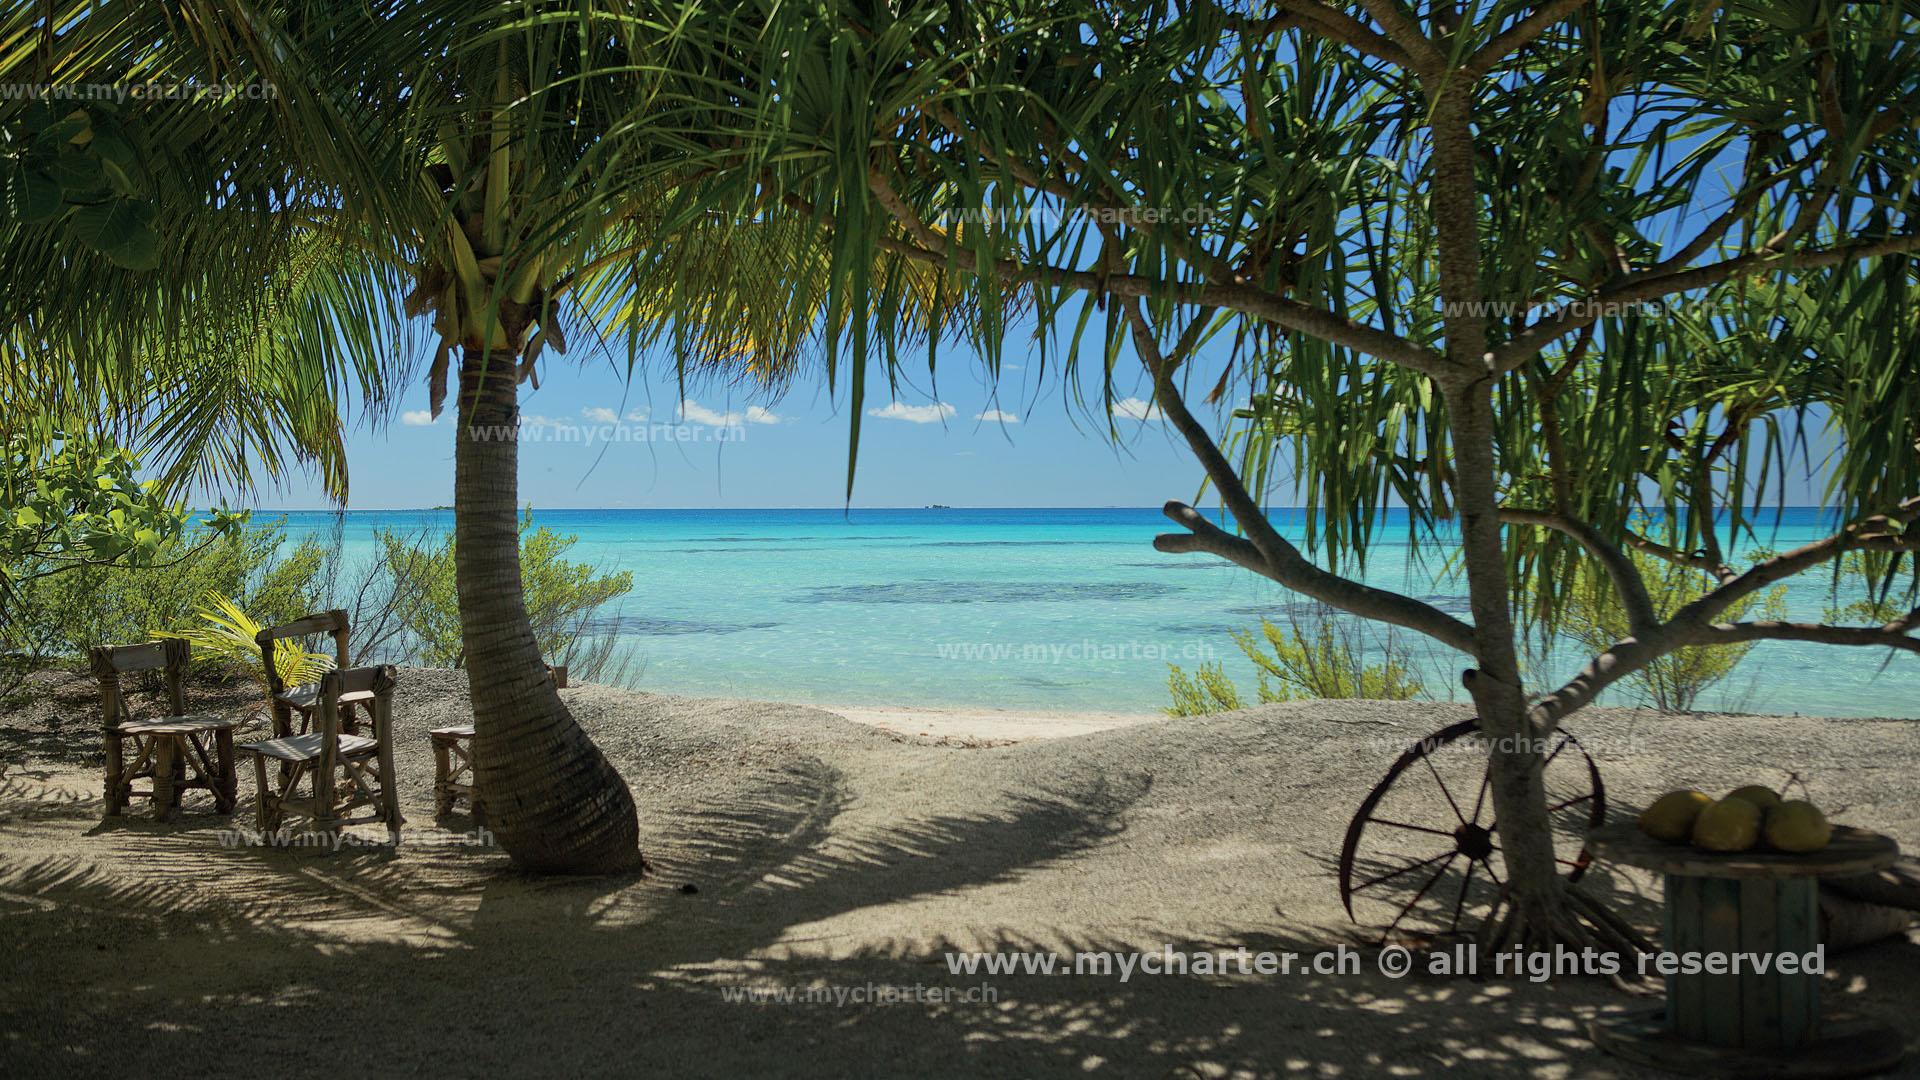 Yachtcharter Südesee - Tahiti - Tikehau